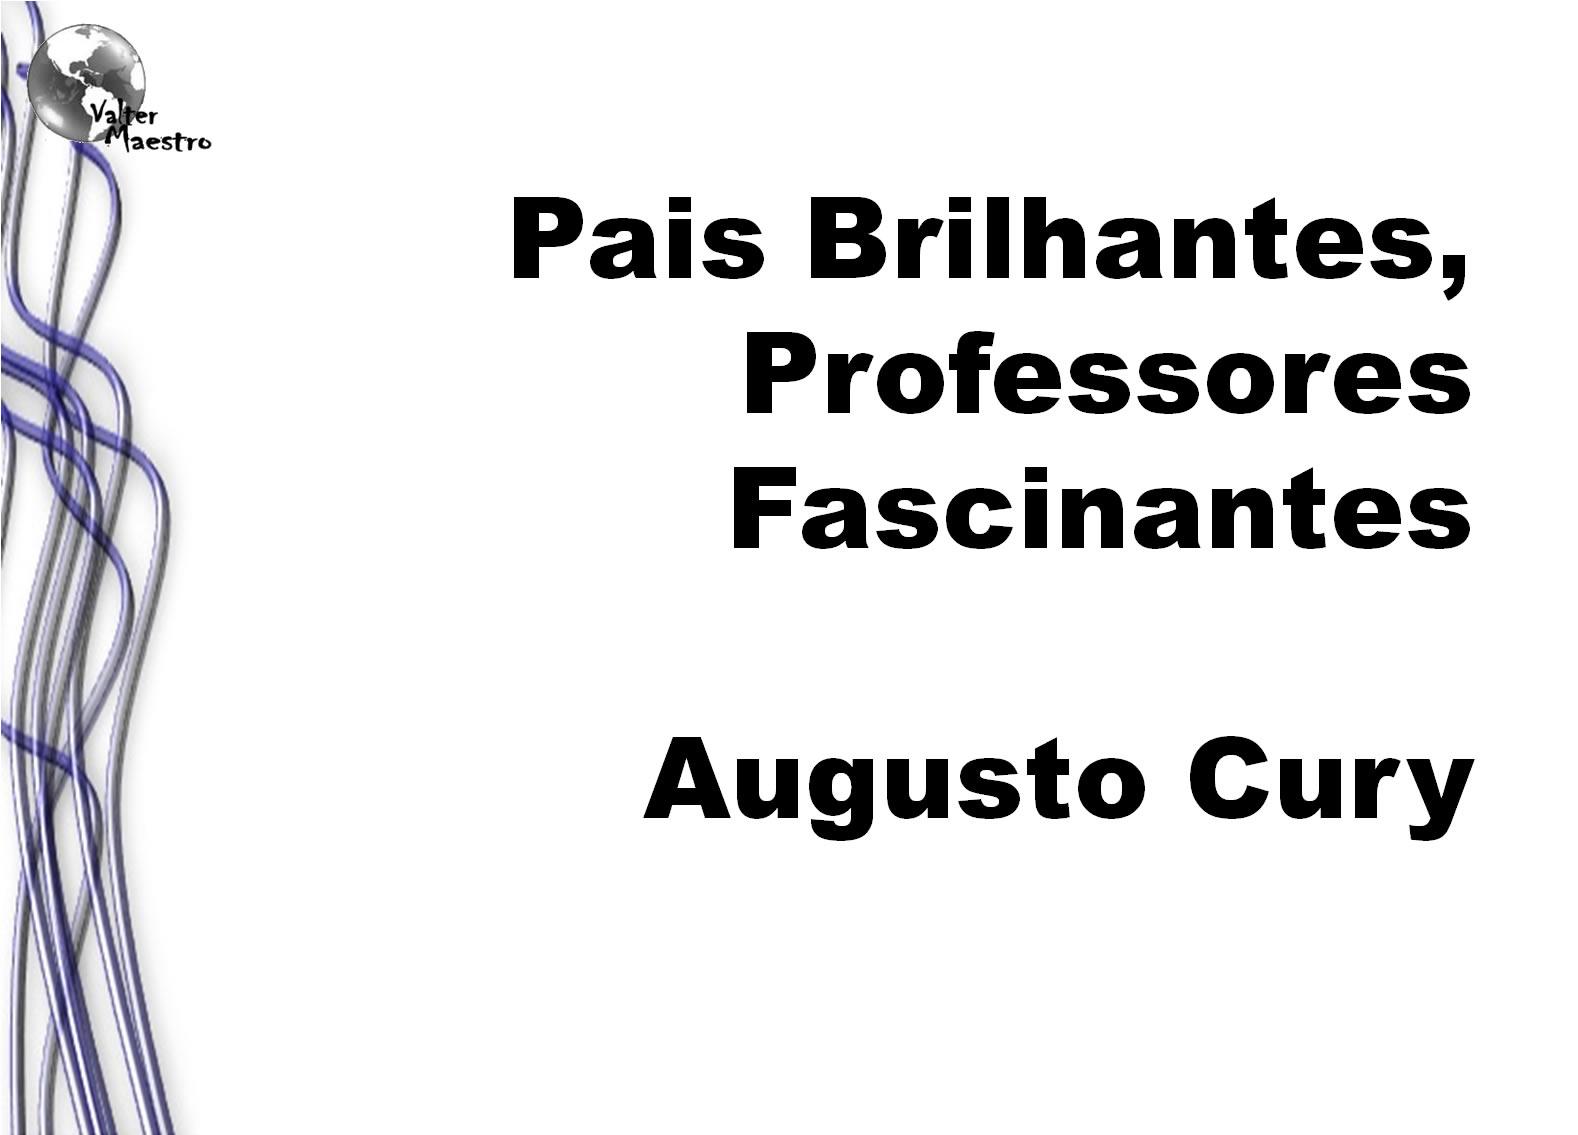 Valther Maestro Pais Brilhantes Professores Fascinantes Augusto Cury